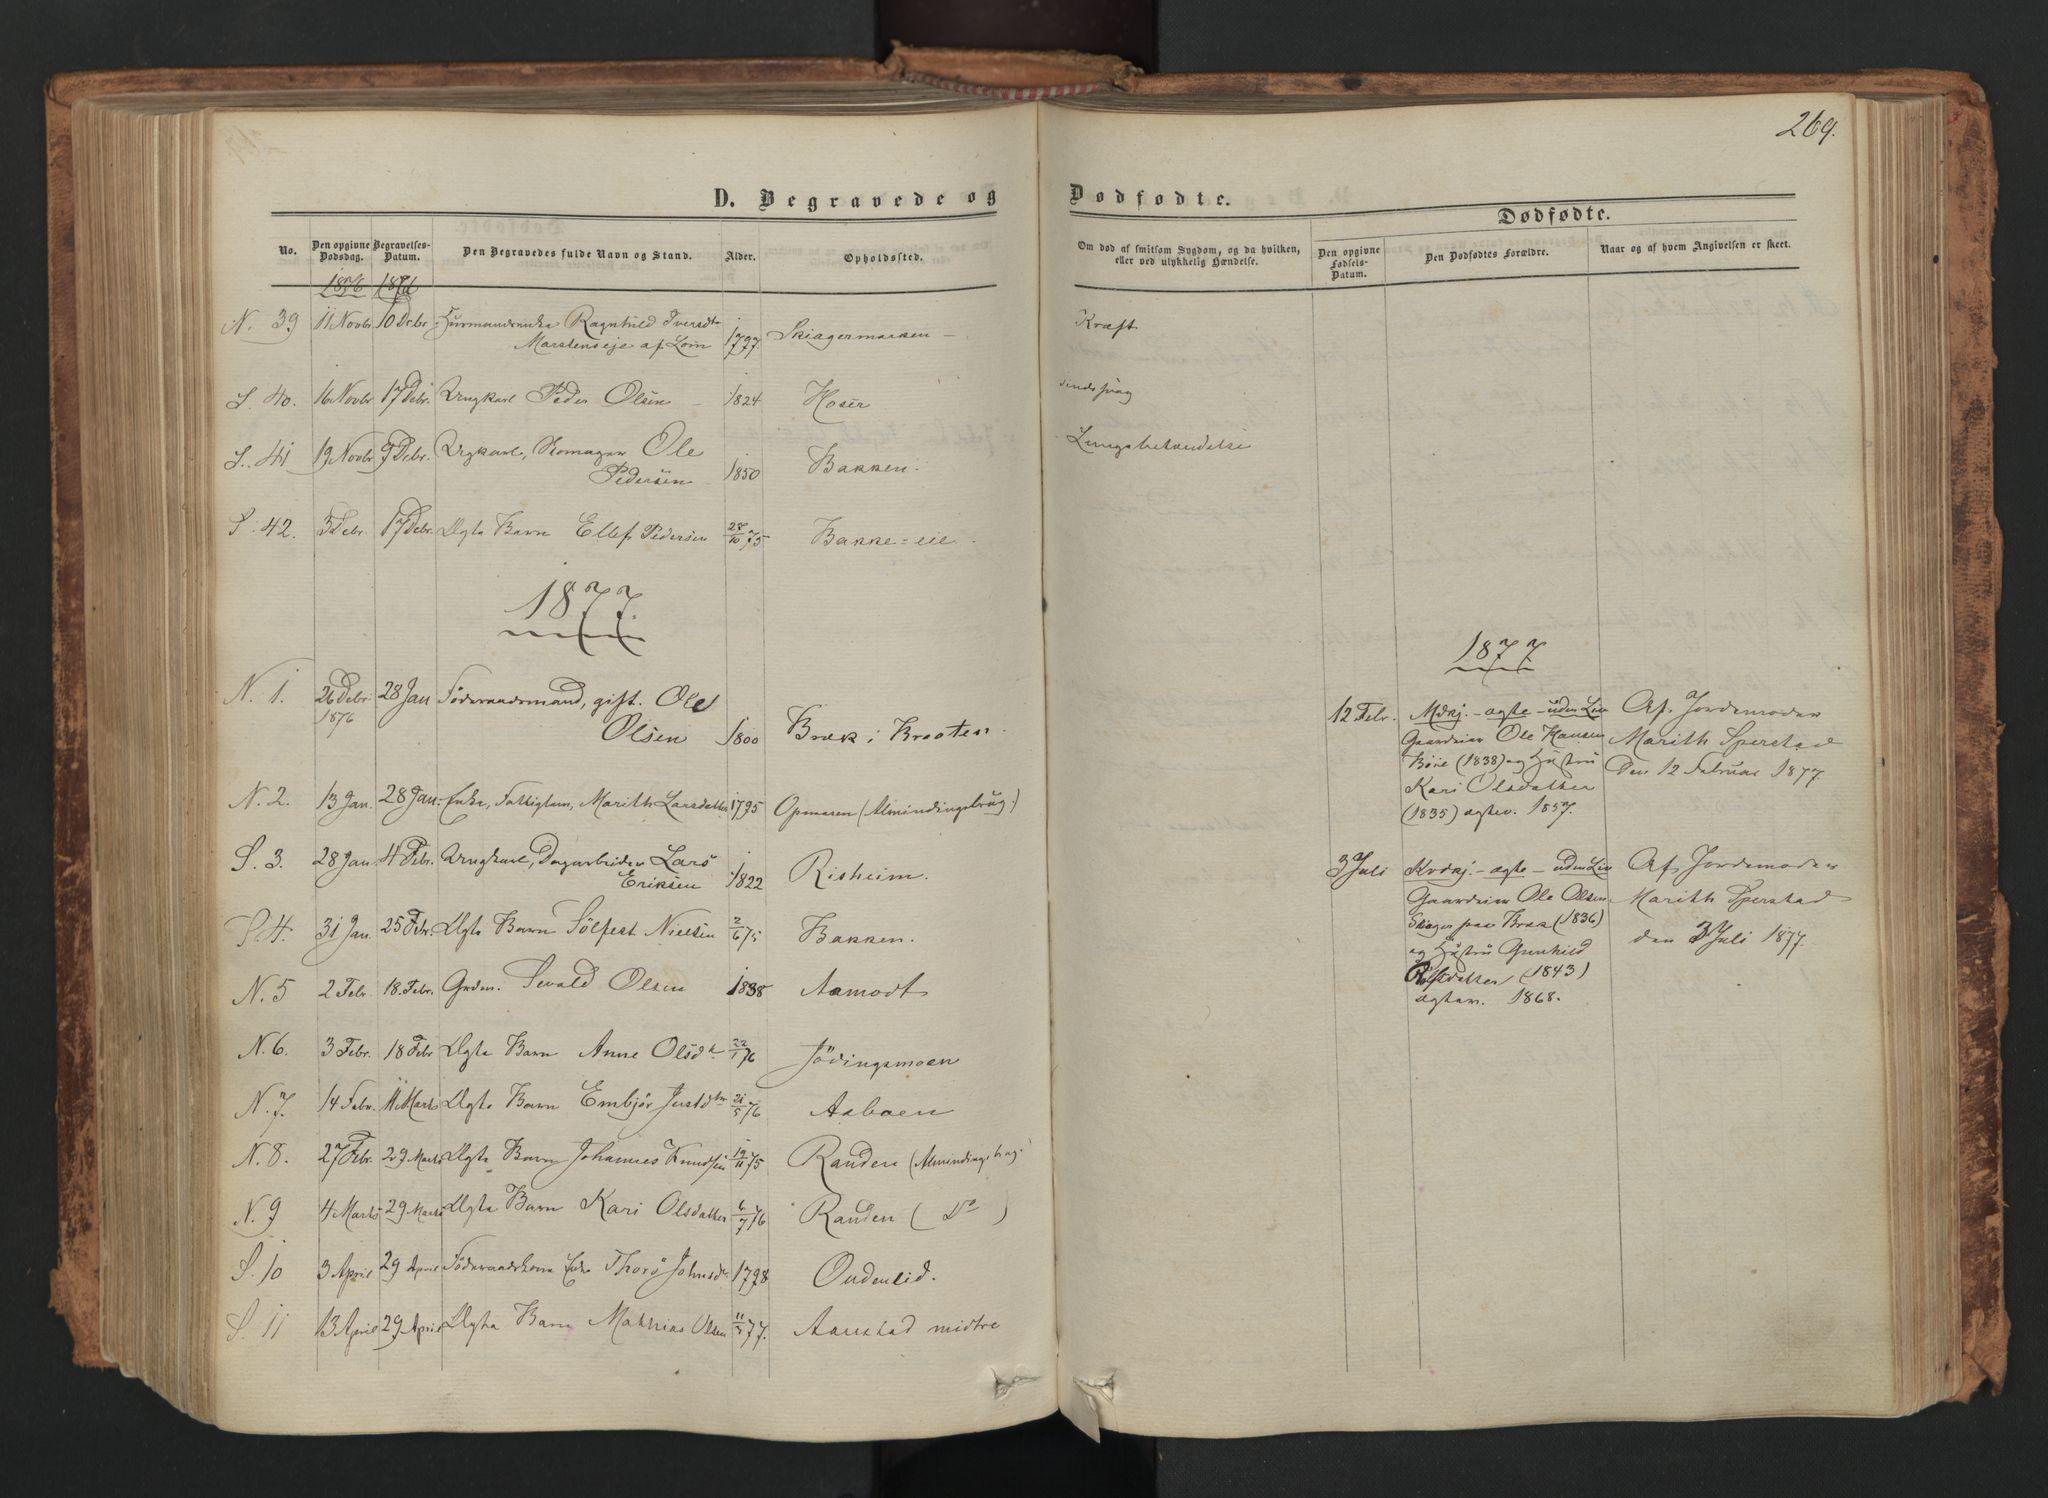 SAH, Skjåk prestekontor, Ministerialbok nr. 1, 1863-1879, s. 269